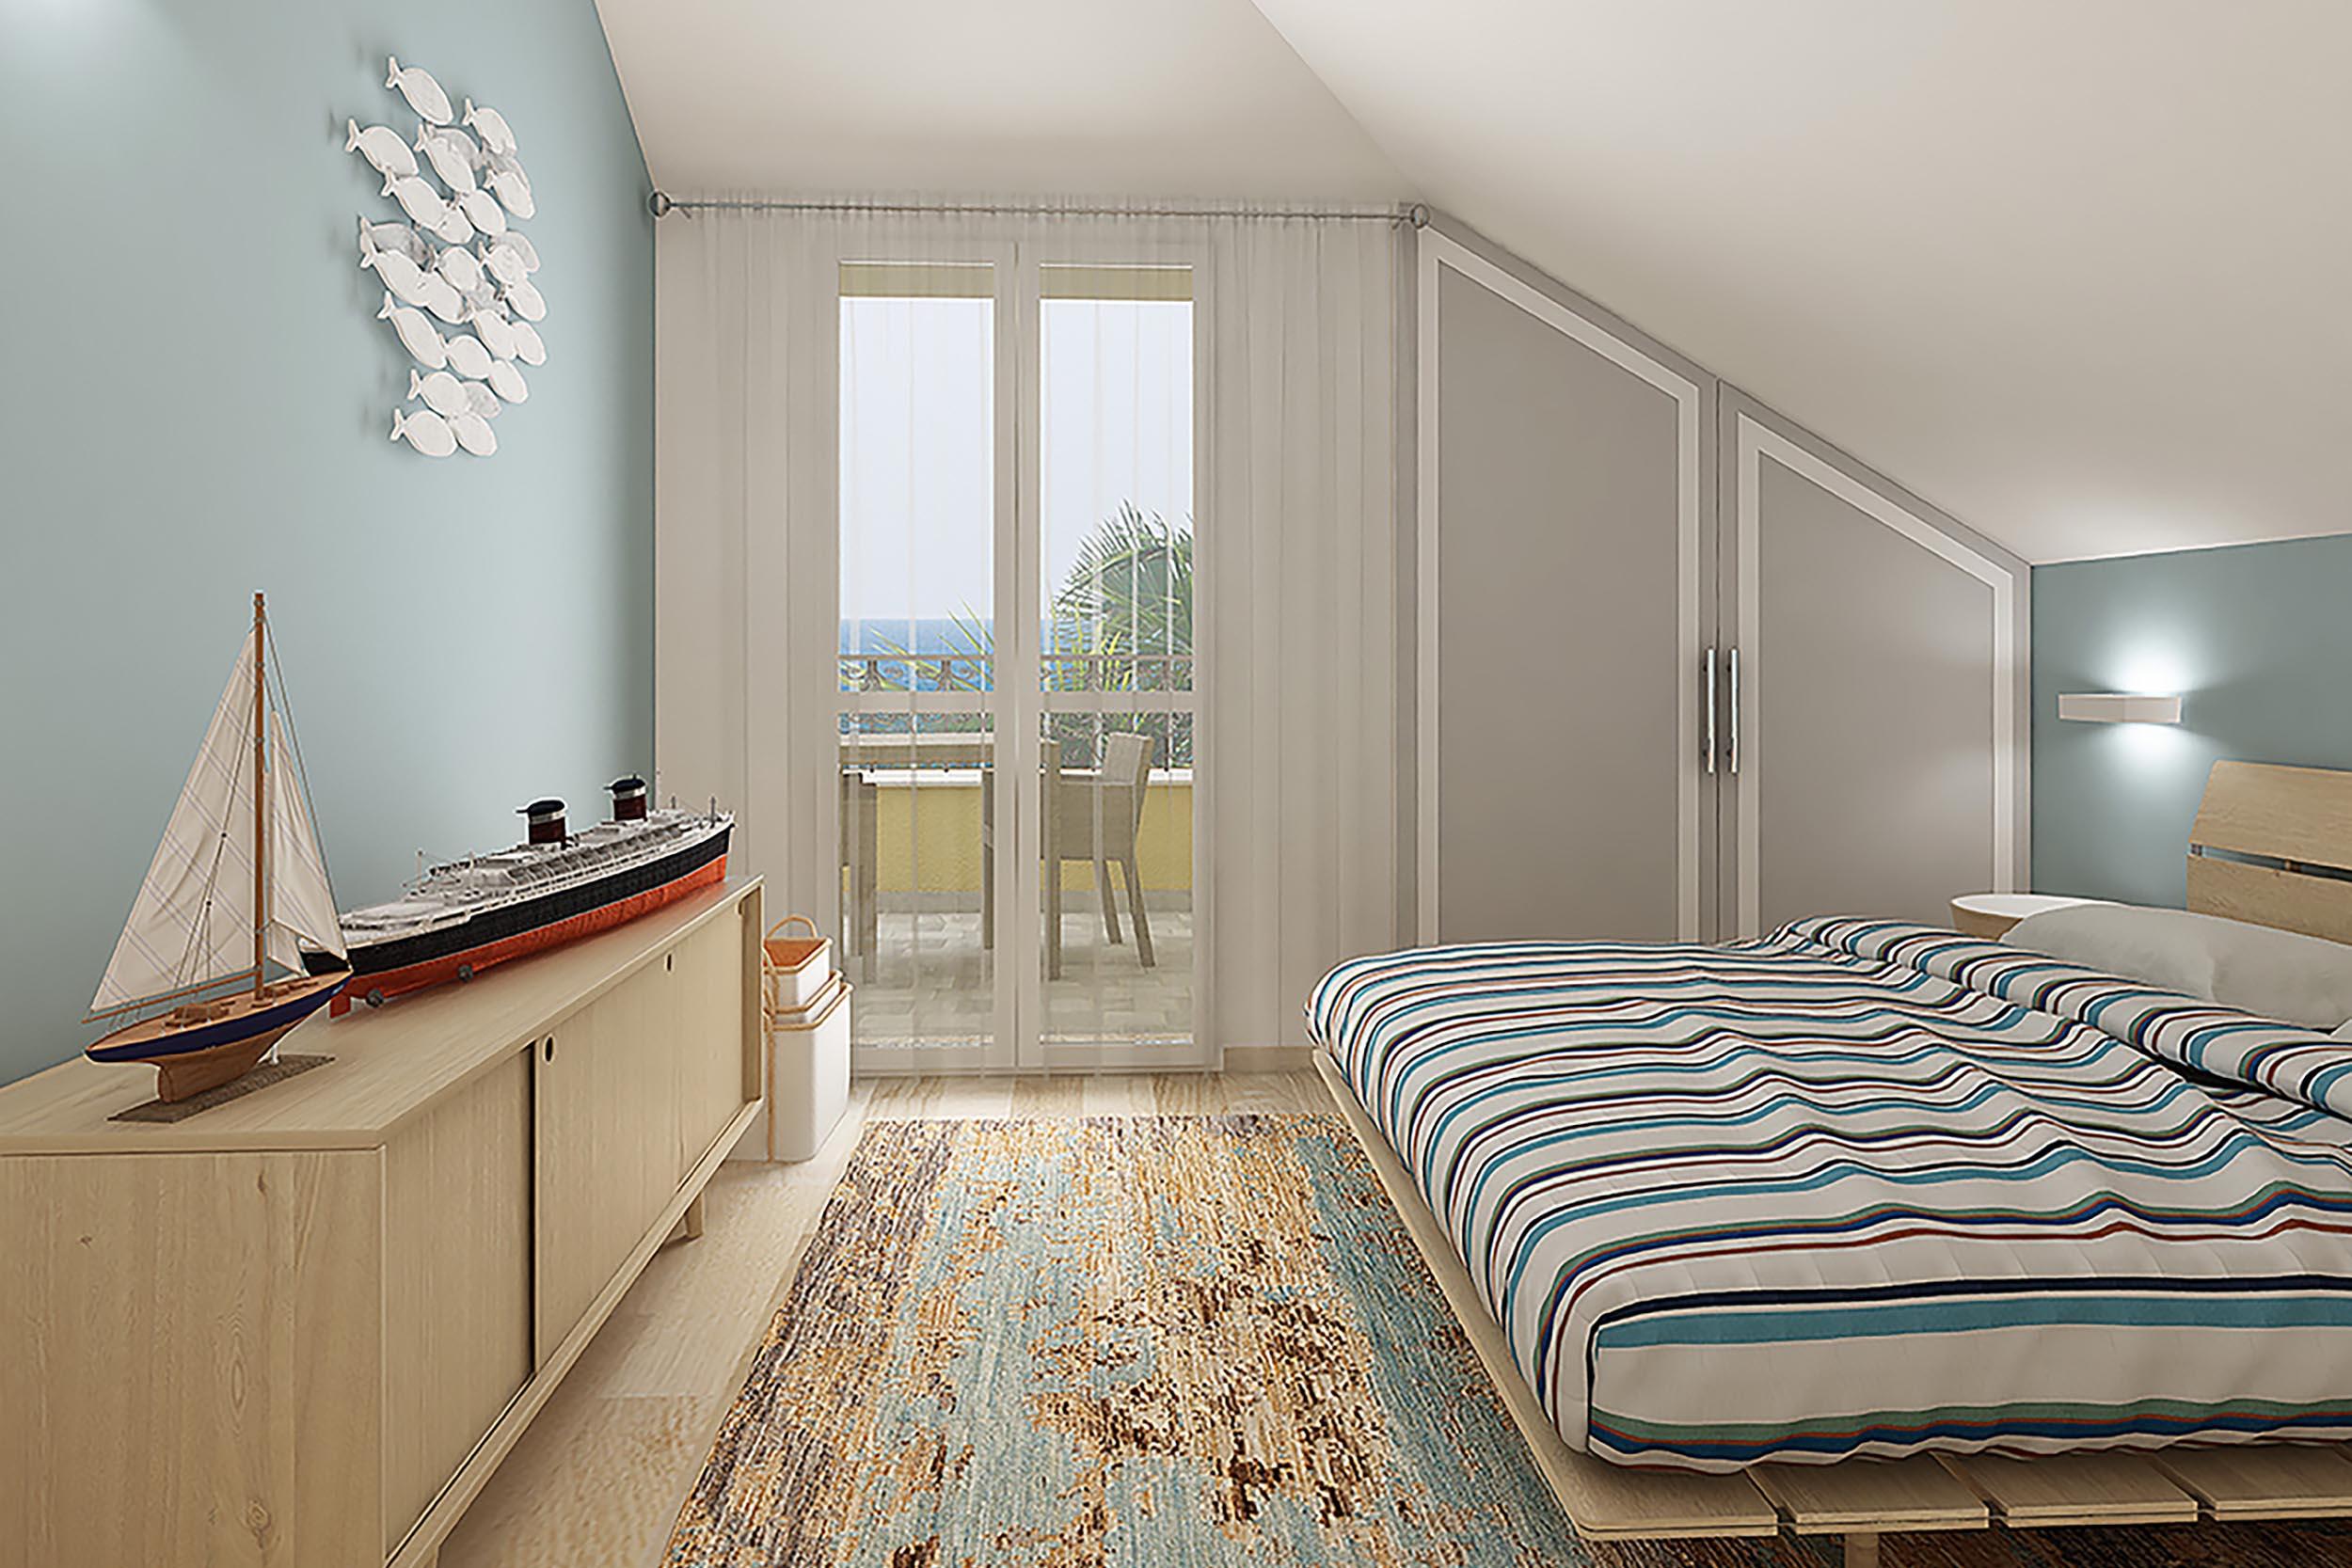 Daimm vendita nervi via val cismon viale delle palme villa render camera da letto mansarda - Camera da letto in mansarda ...